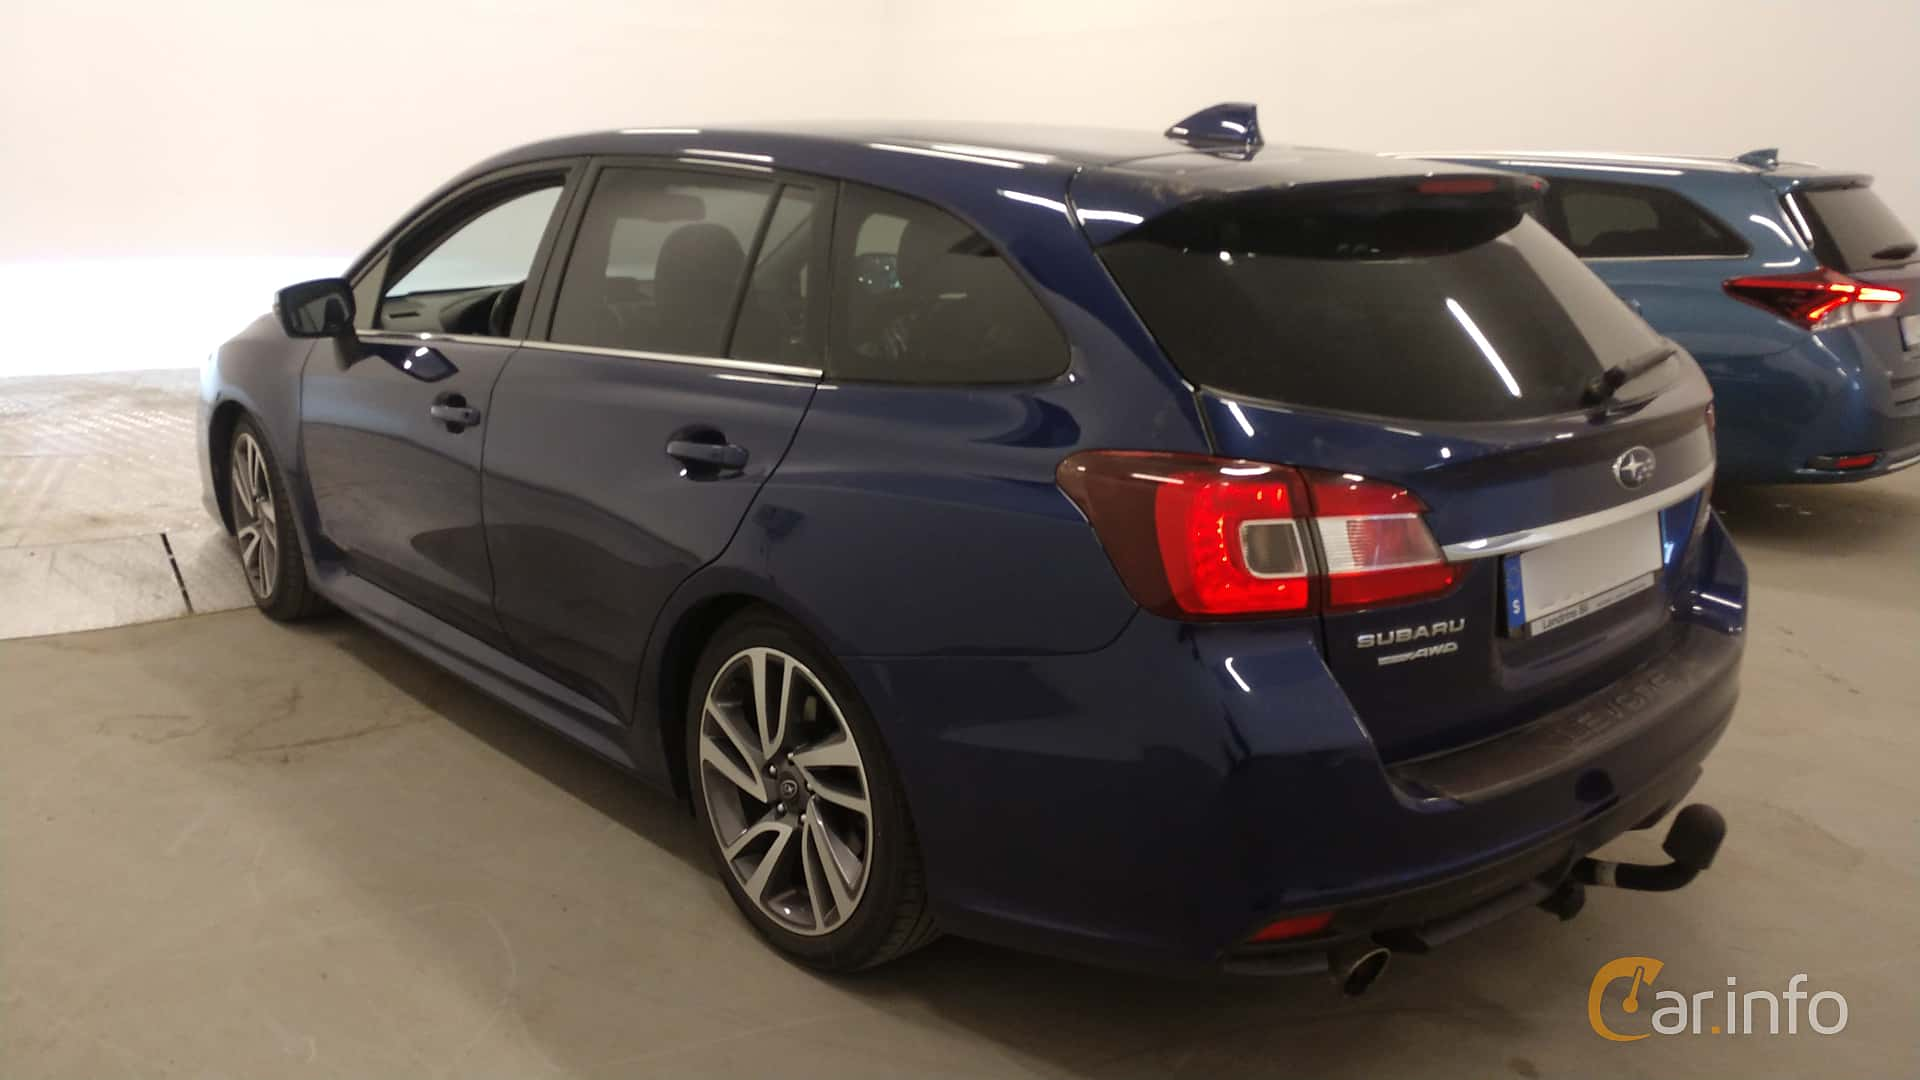 Subaru Levorg 1.6 4WD Lineartronic, 170hp, 2016